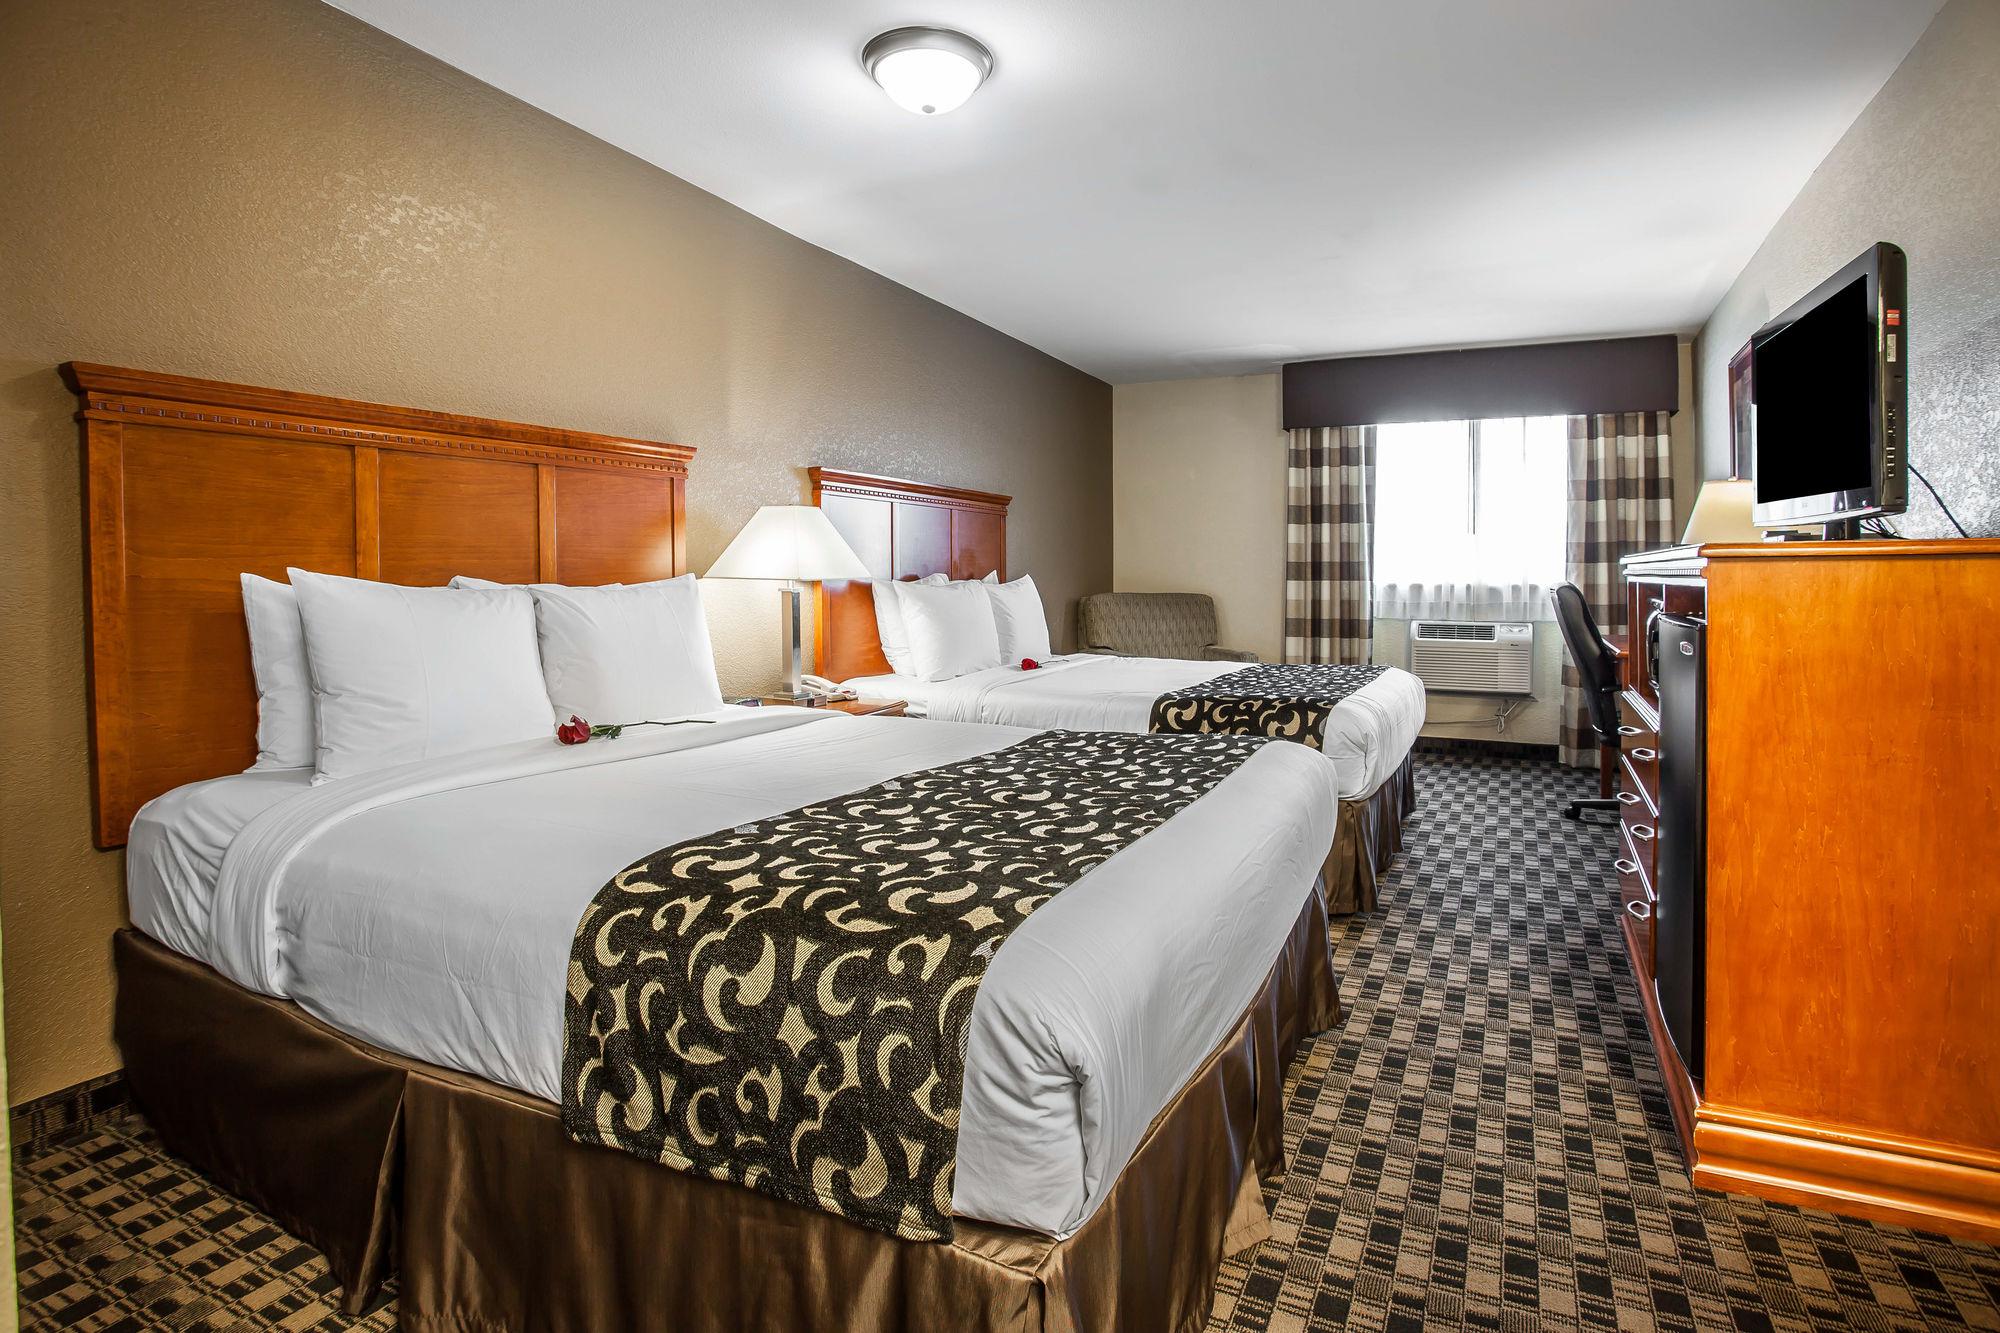 renton hotel coupons for renton washington. Black Bedroom Furniture Sets. Home Design Ideas